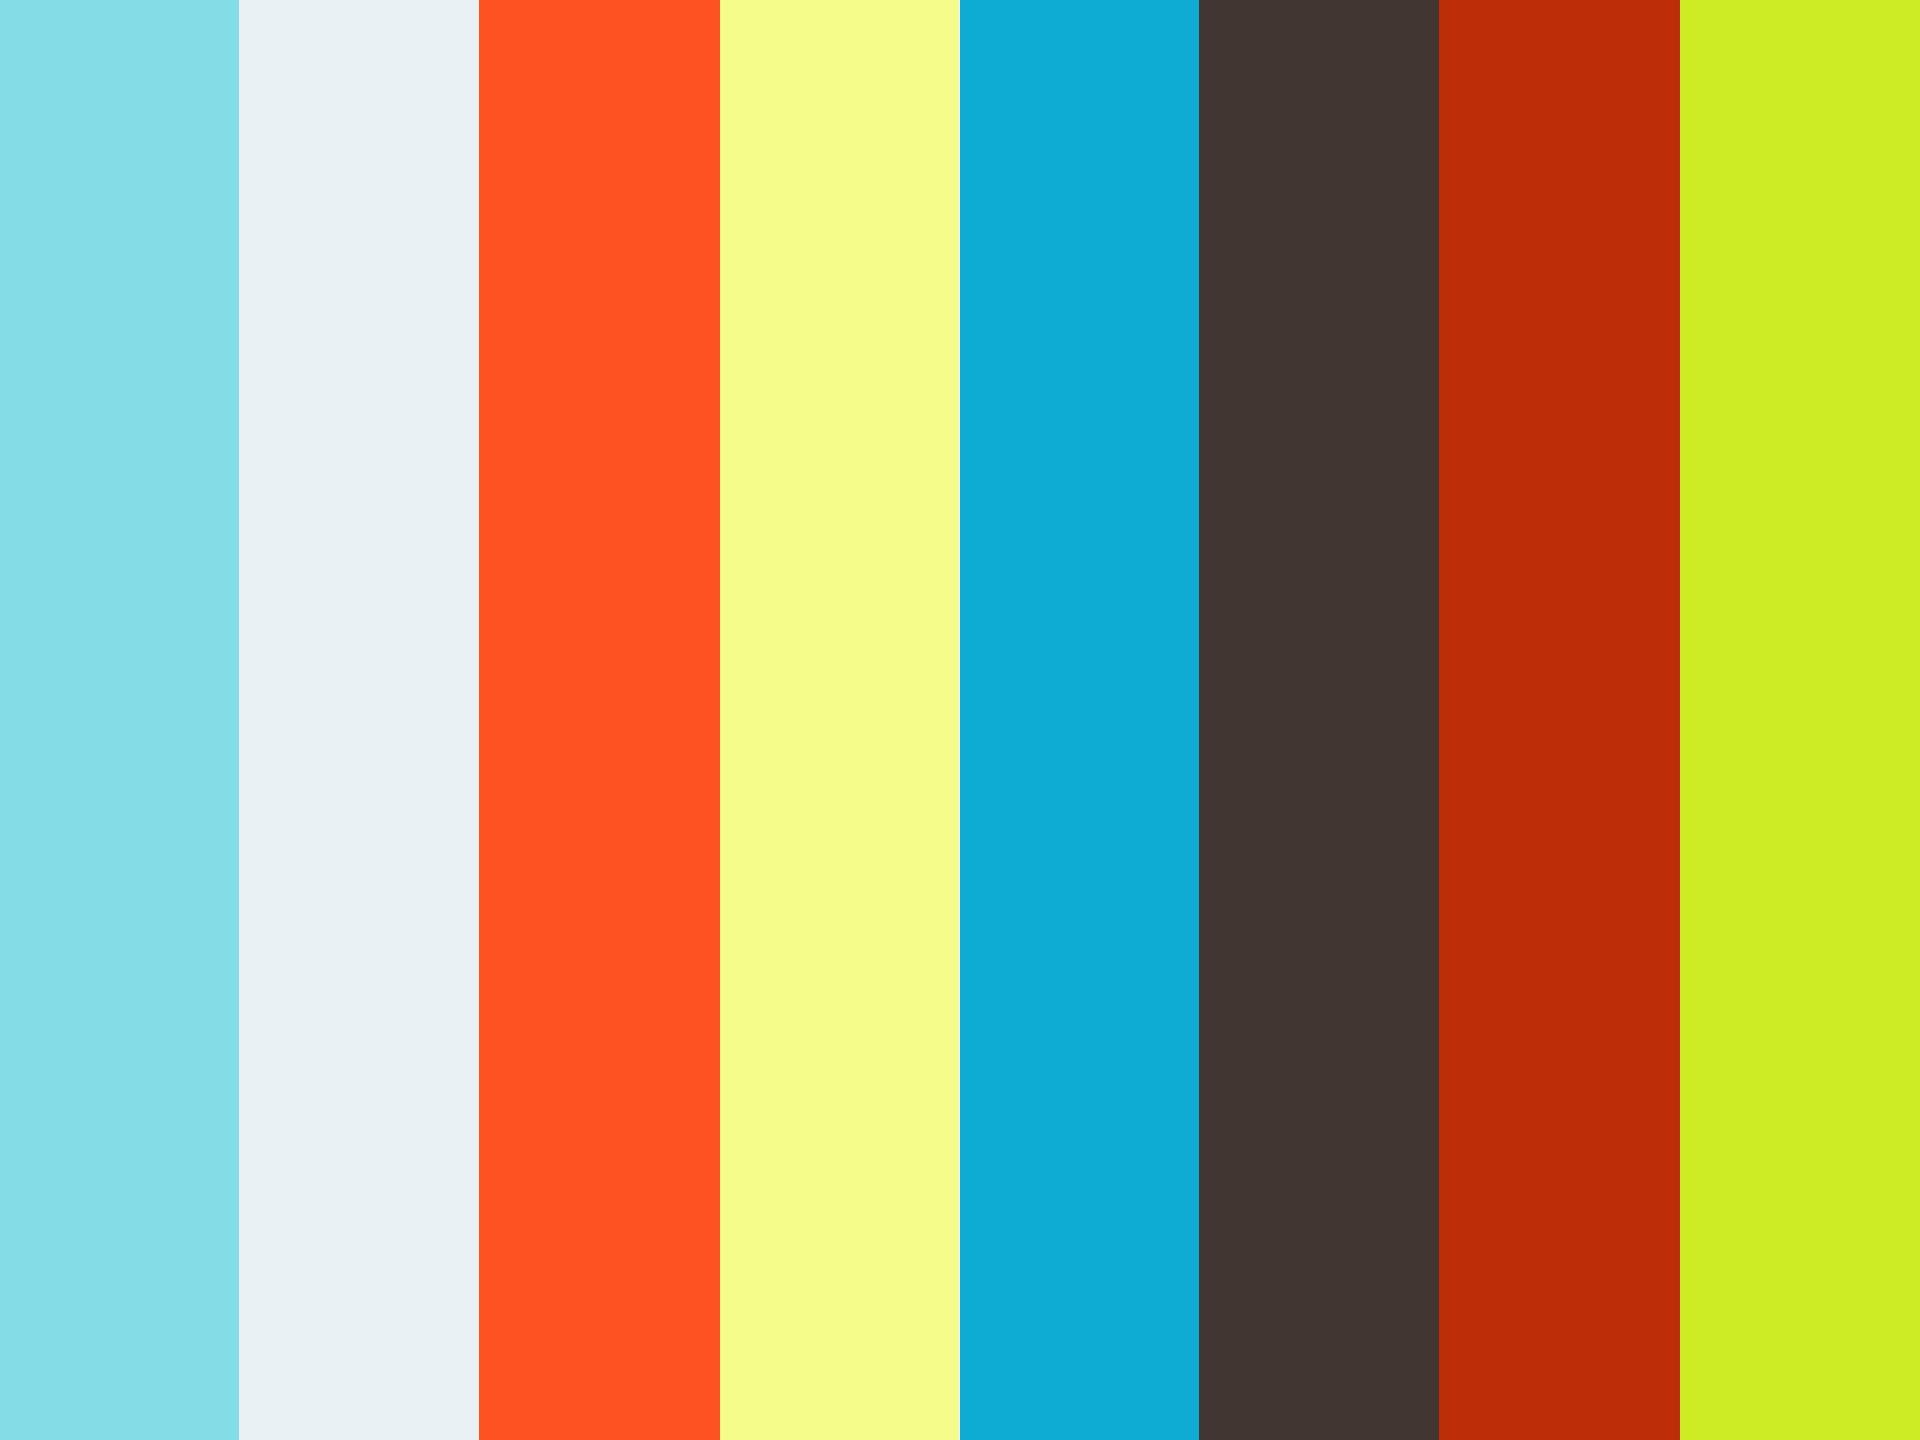 DODGE RAM - WHITE - 2019